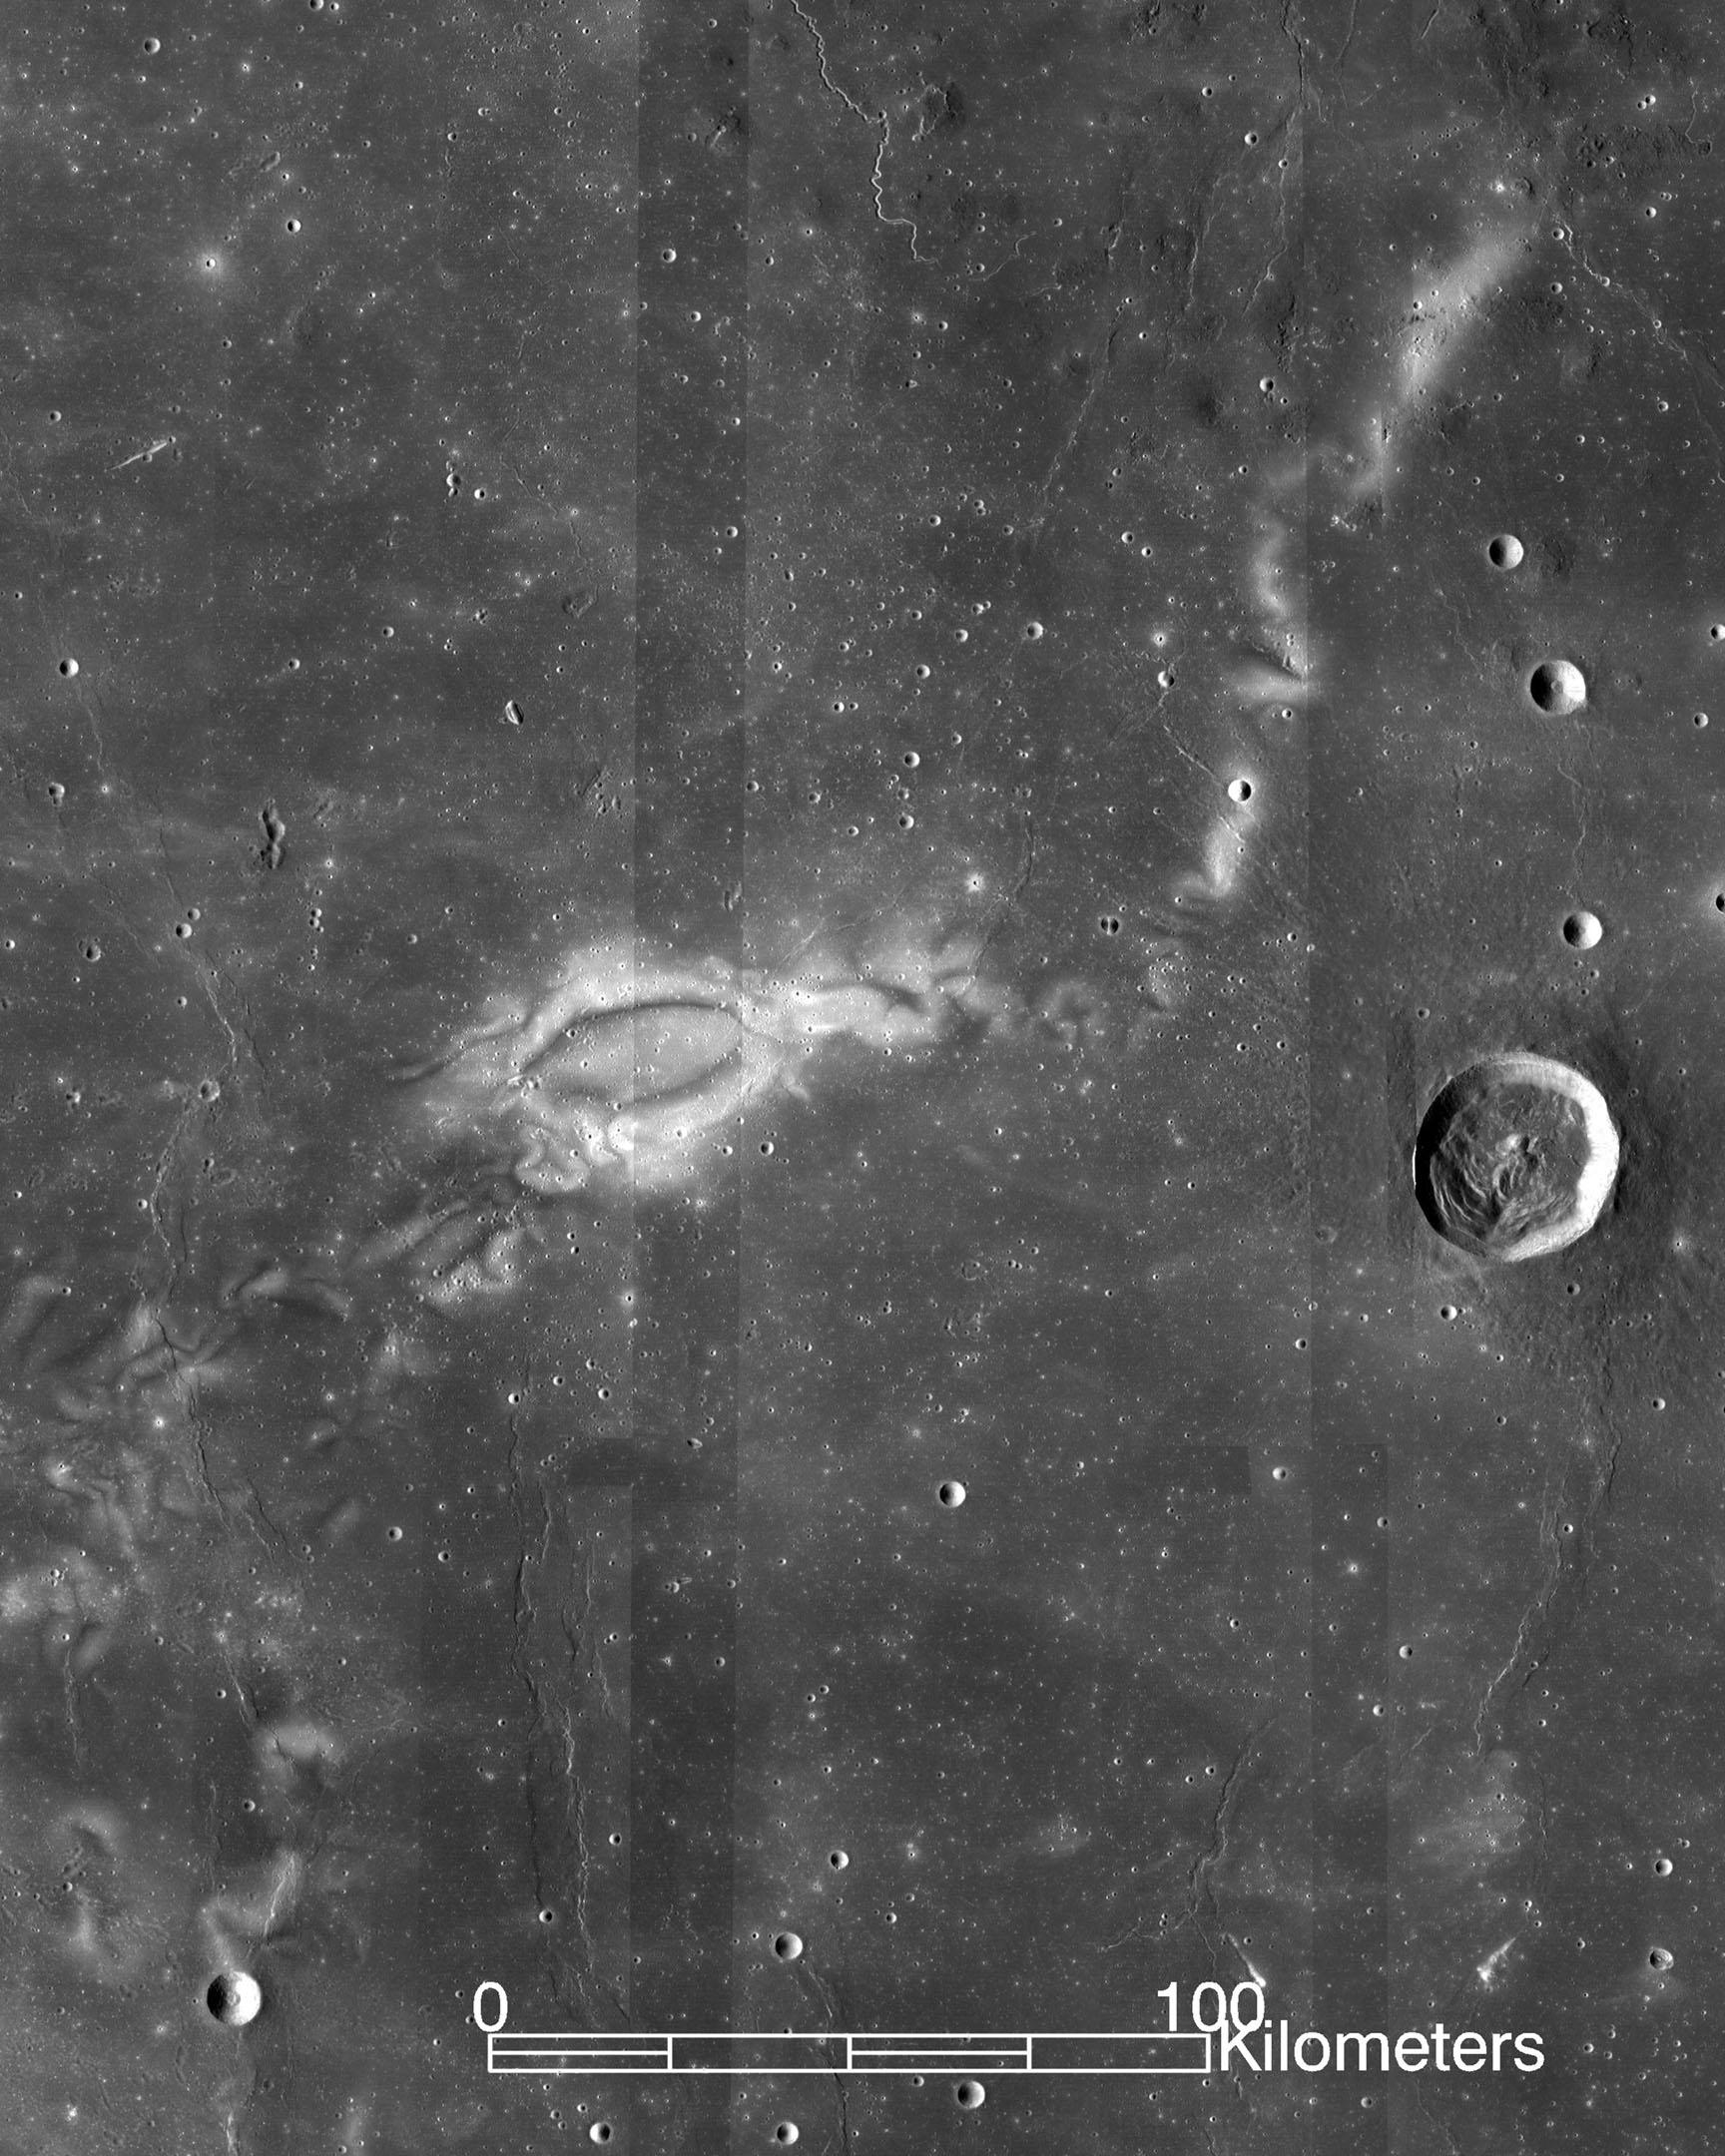 Reiner Gamma lunar swirl. Image credit: NASA/LRO